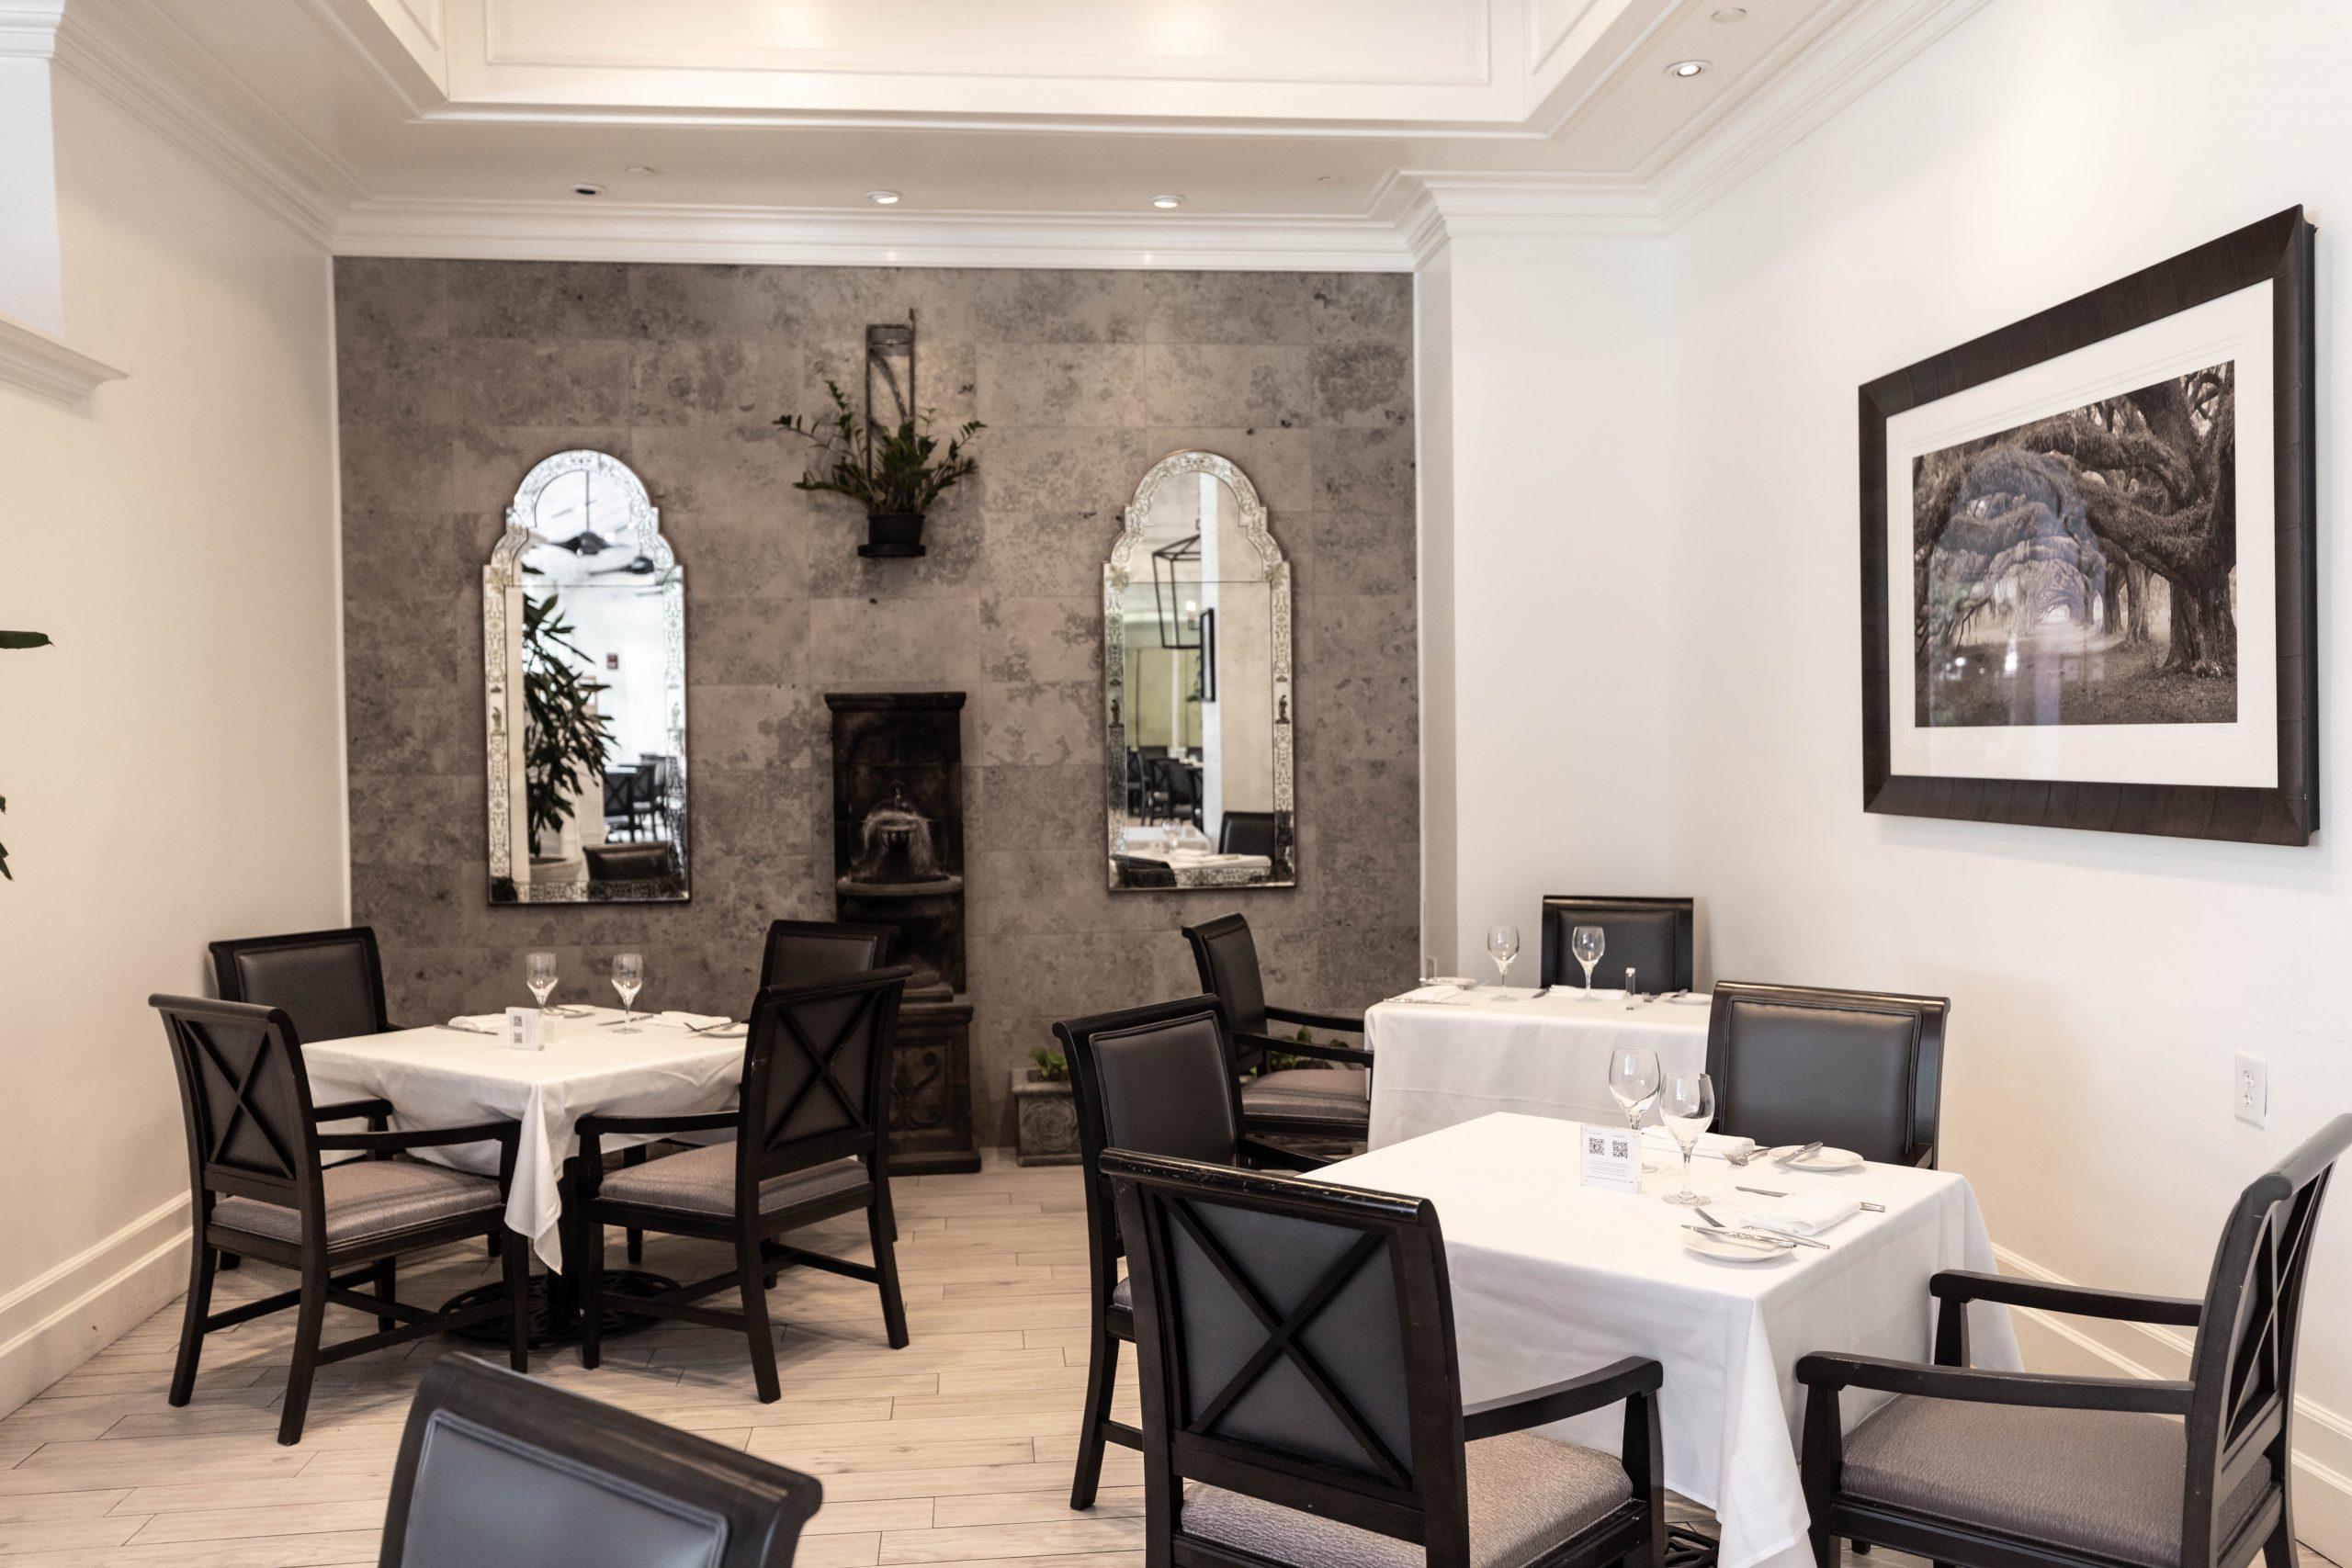 Décor at Palmetto Café Inside Belmond Charleston Place Luxury Hotel Written & Photographed by Annie Fairfax